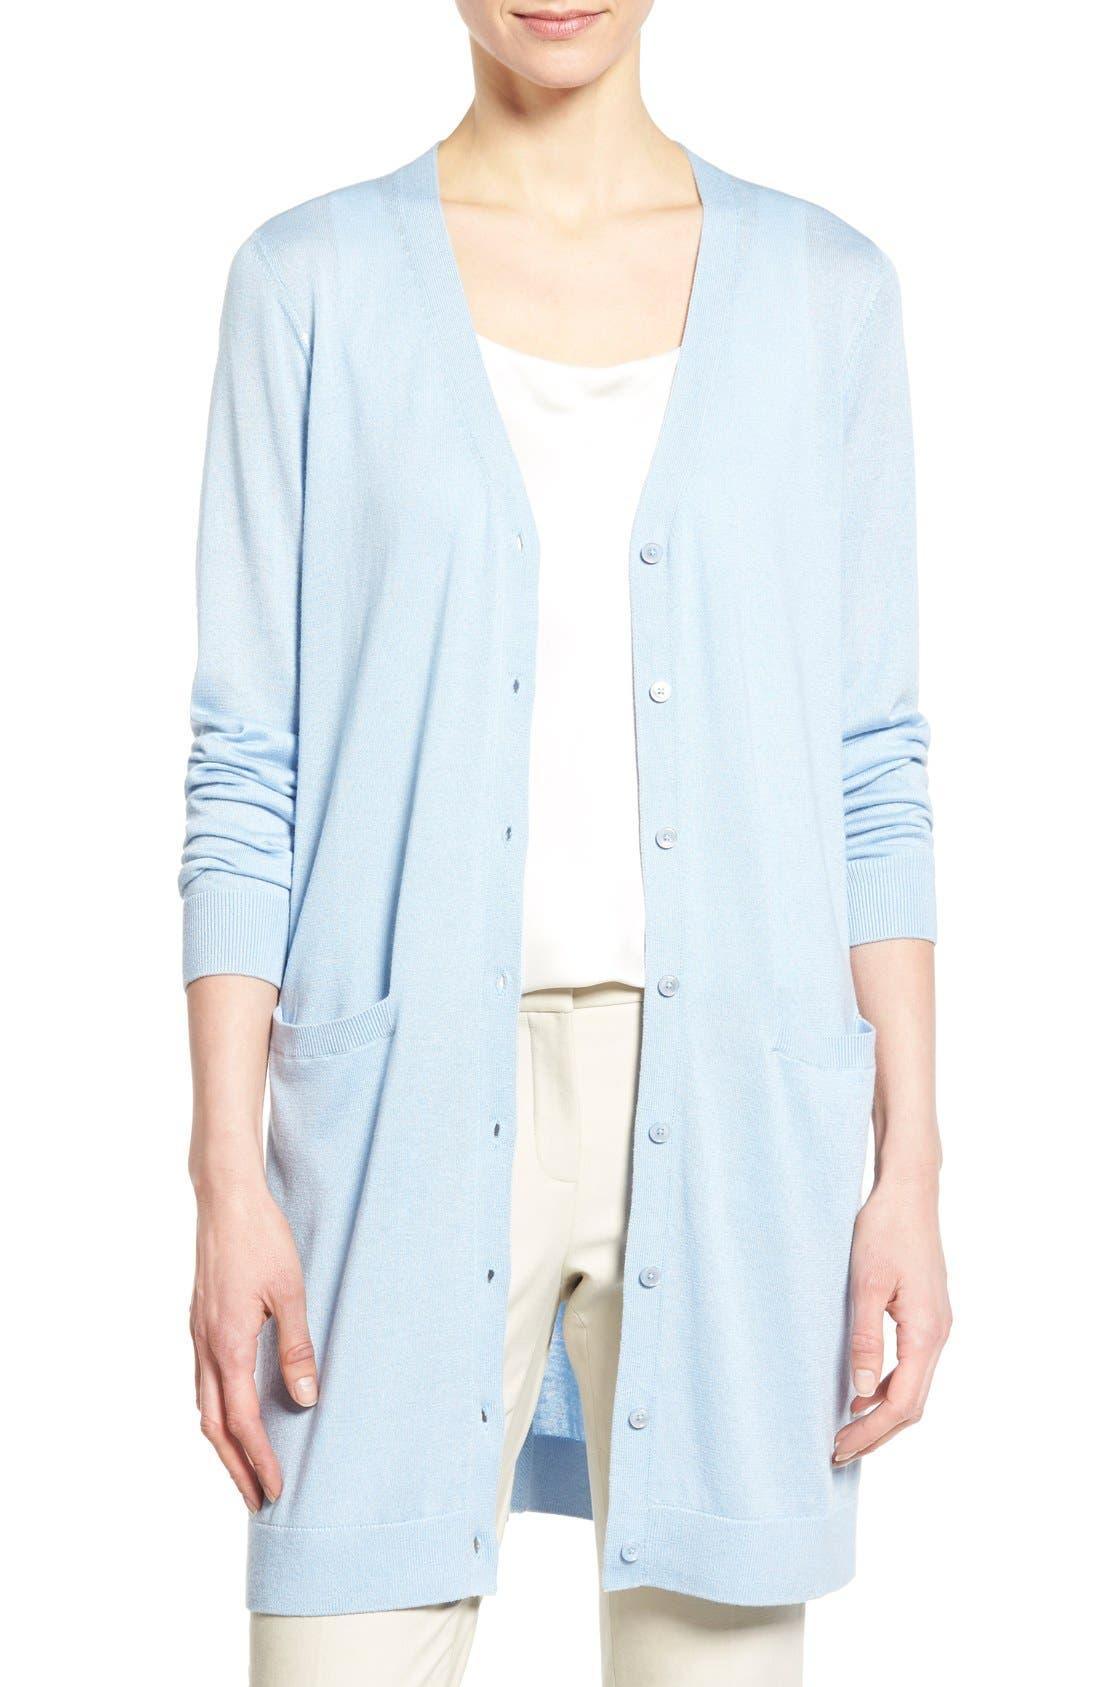 Alternate Image 1 Selected - Nordstrom Collection Silk & Cashmere Long V-Neck Cardigan